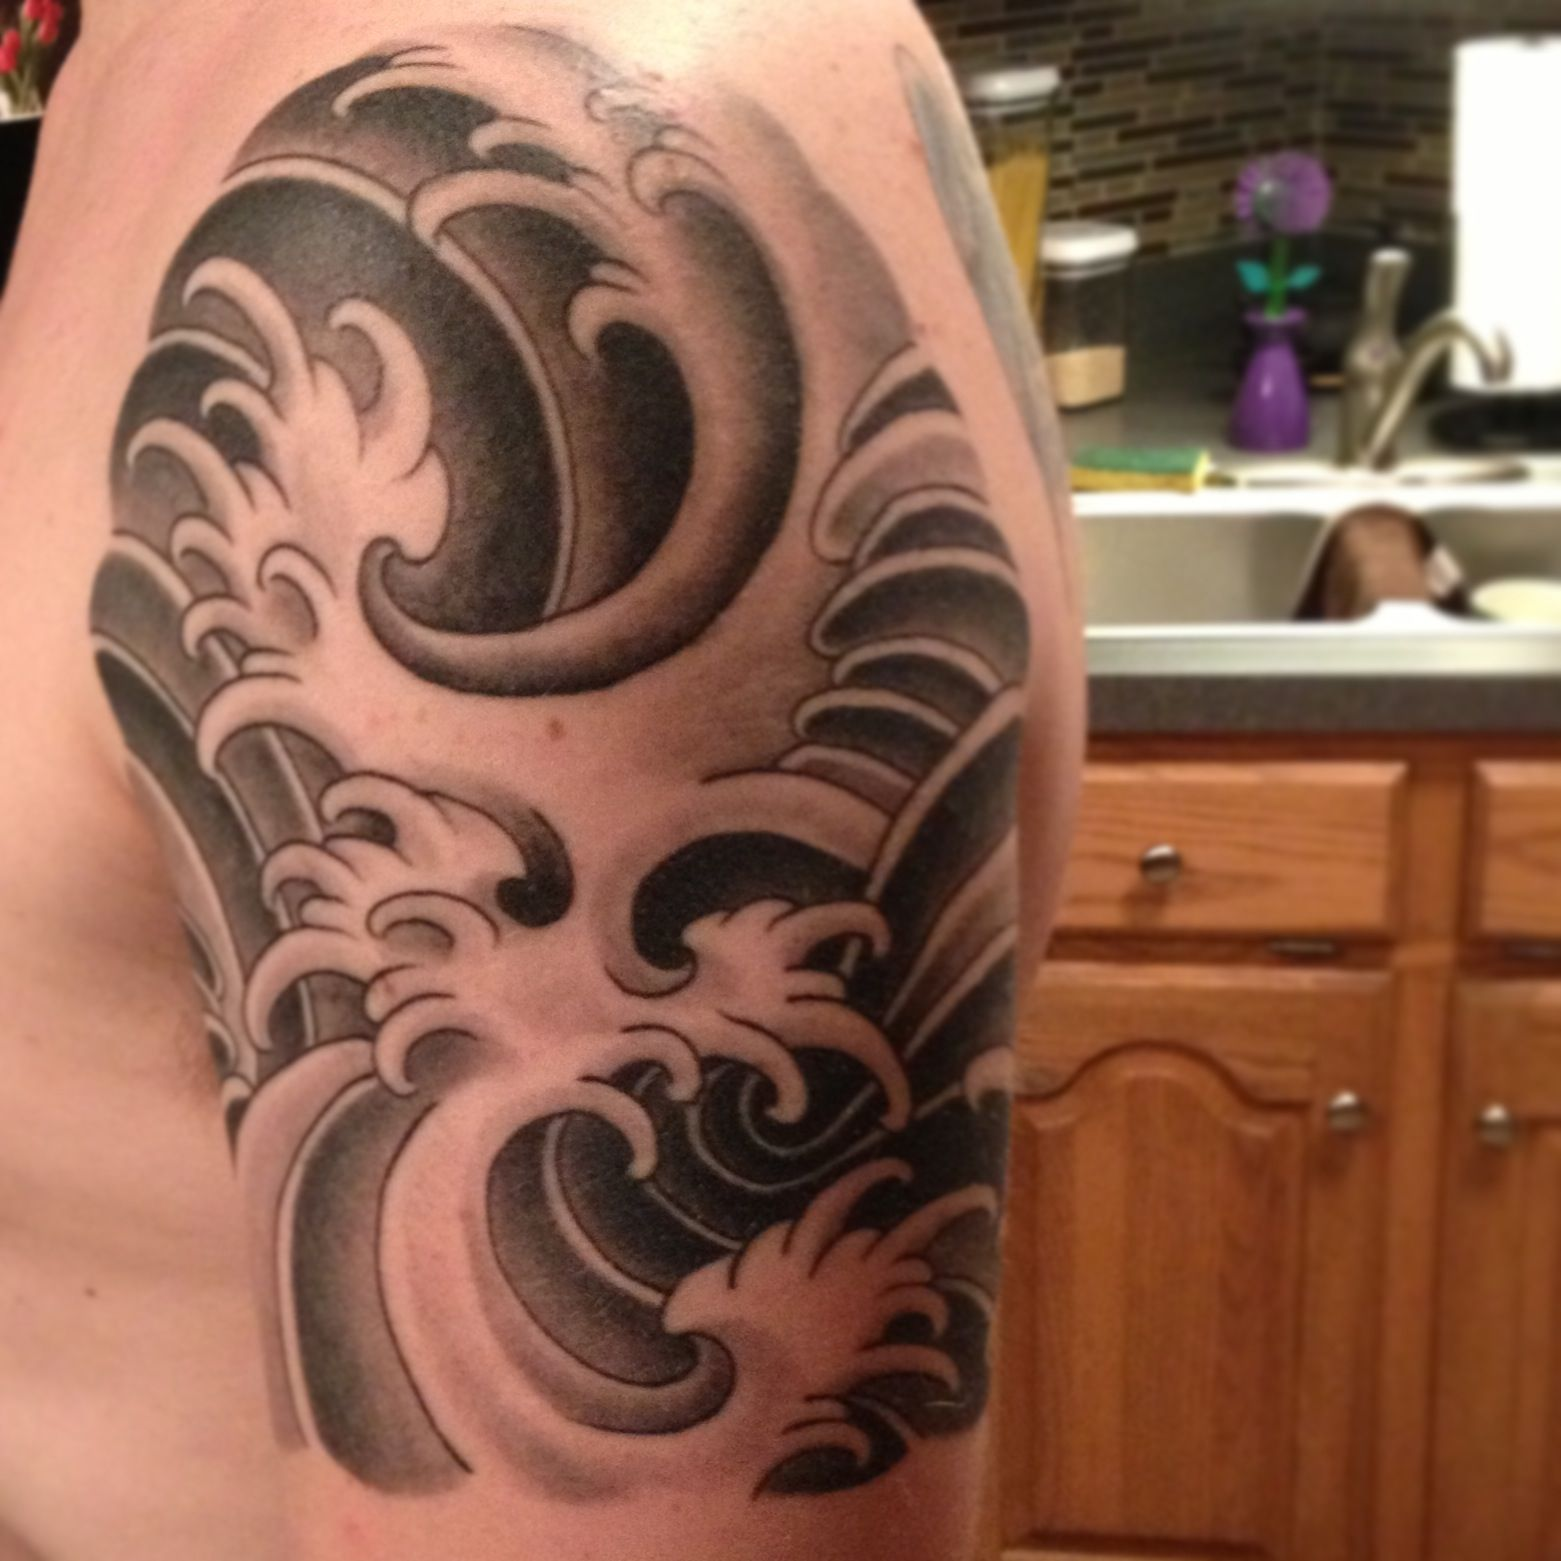 Japanese waves | Tattoos | Pinterest | Japanese waves ...